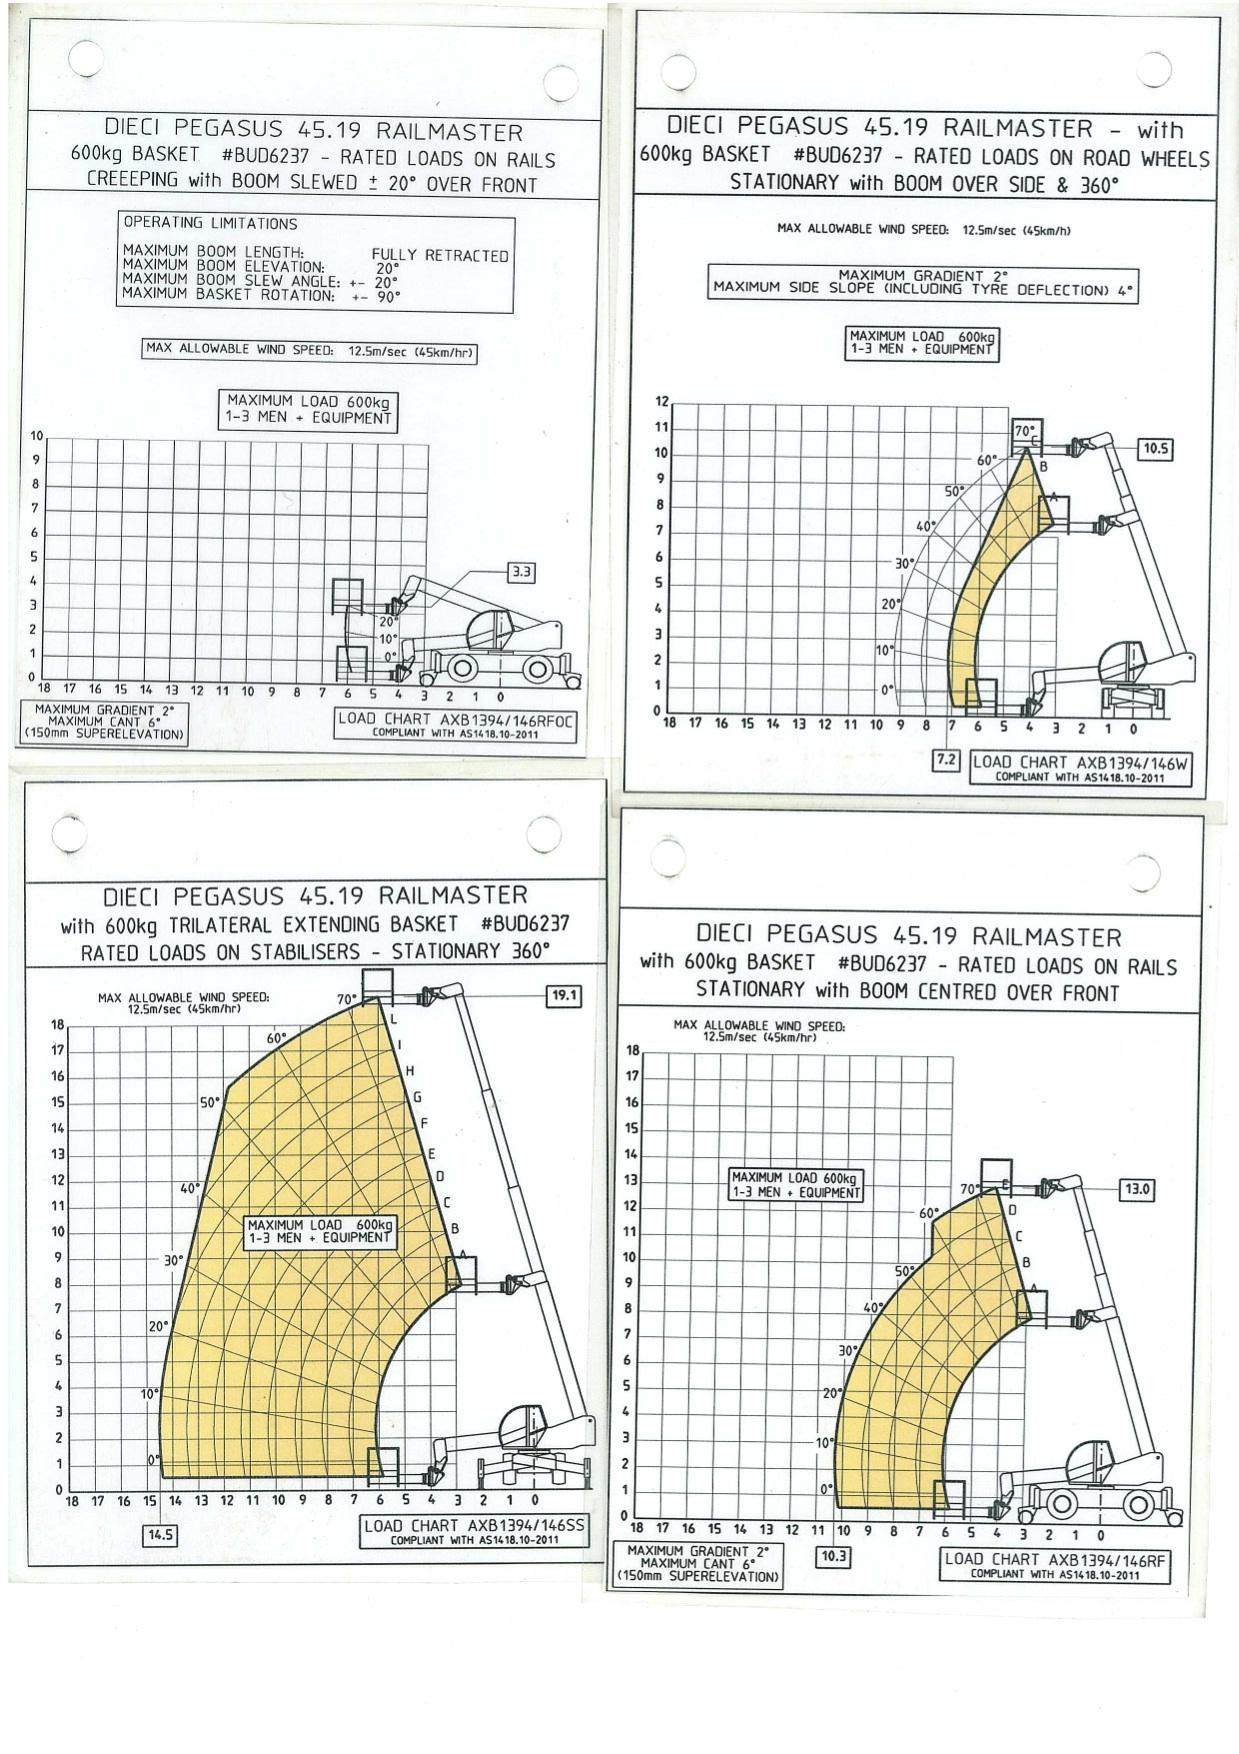 58577D-Dieci-PEGASUS-RAIL-MASTER-Telehandler-Load-Charts-3.jpg